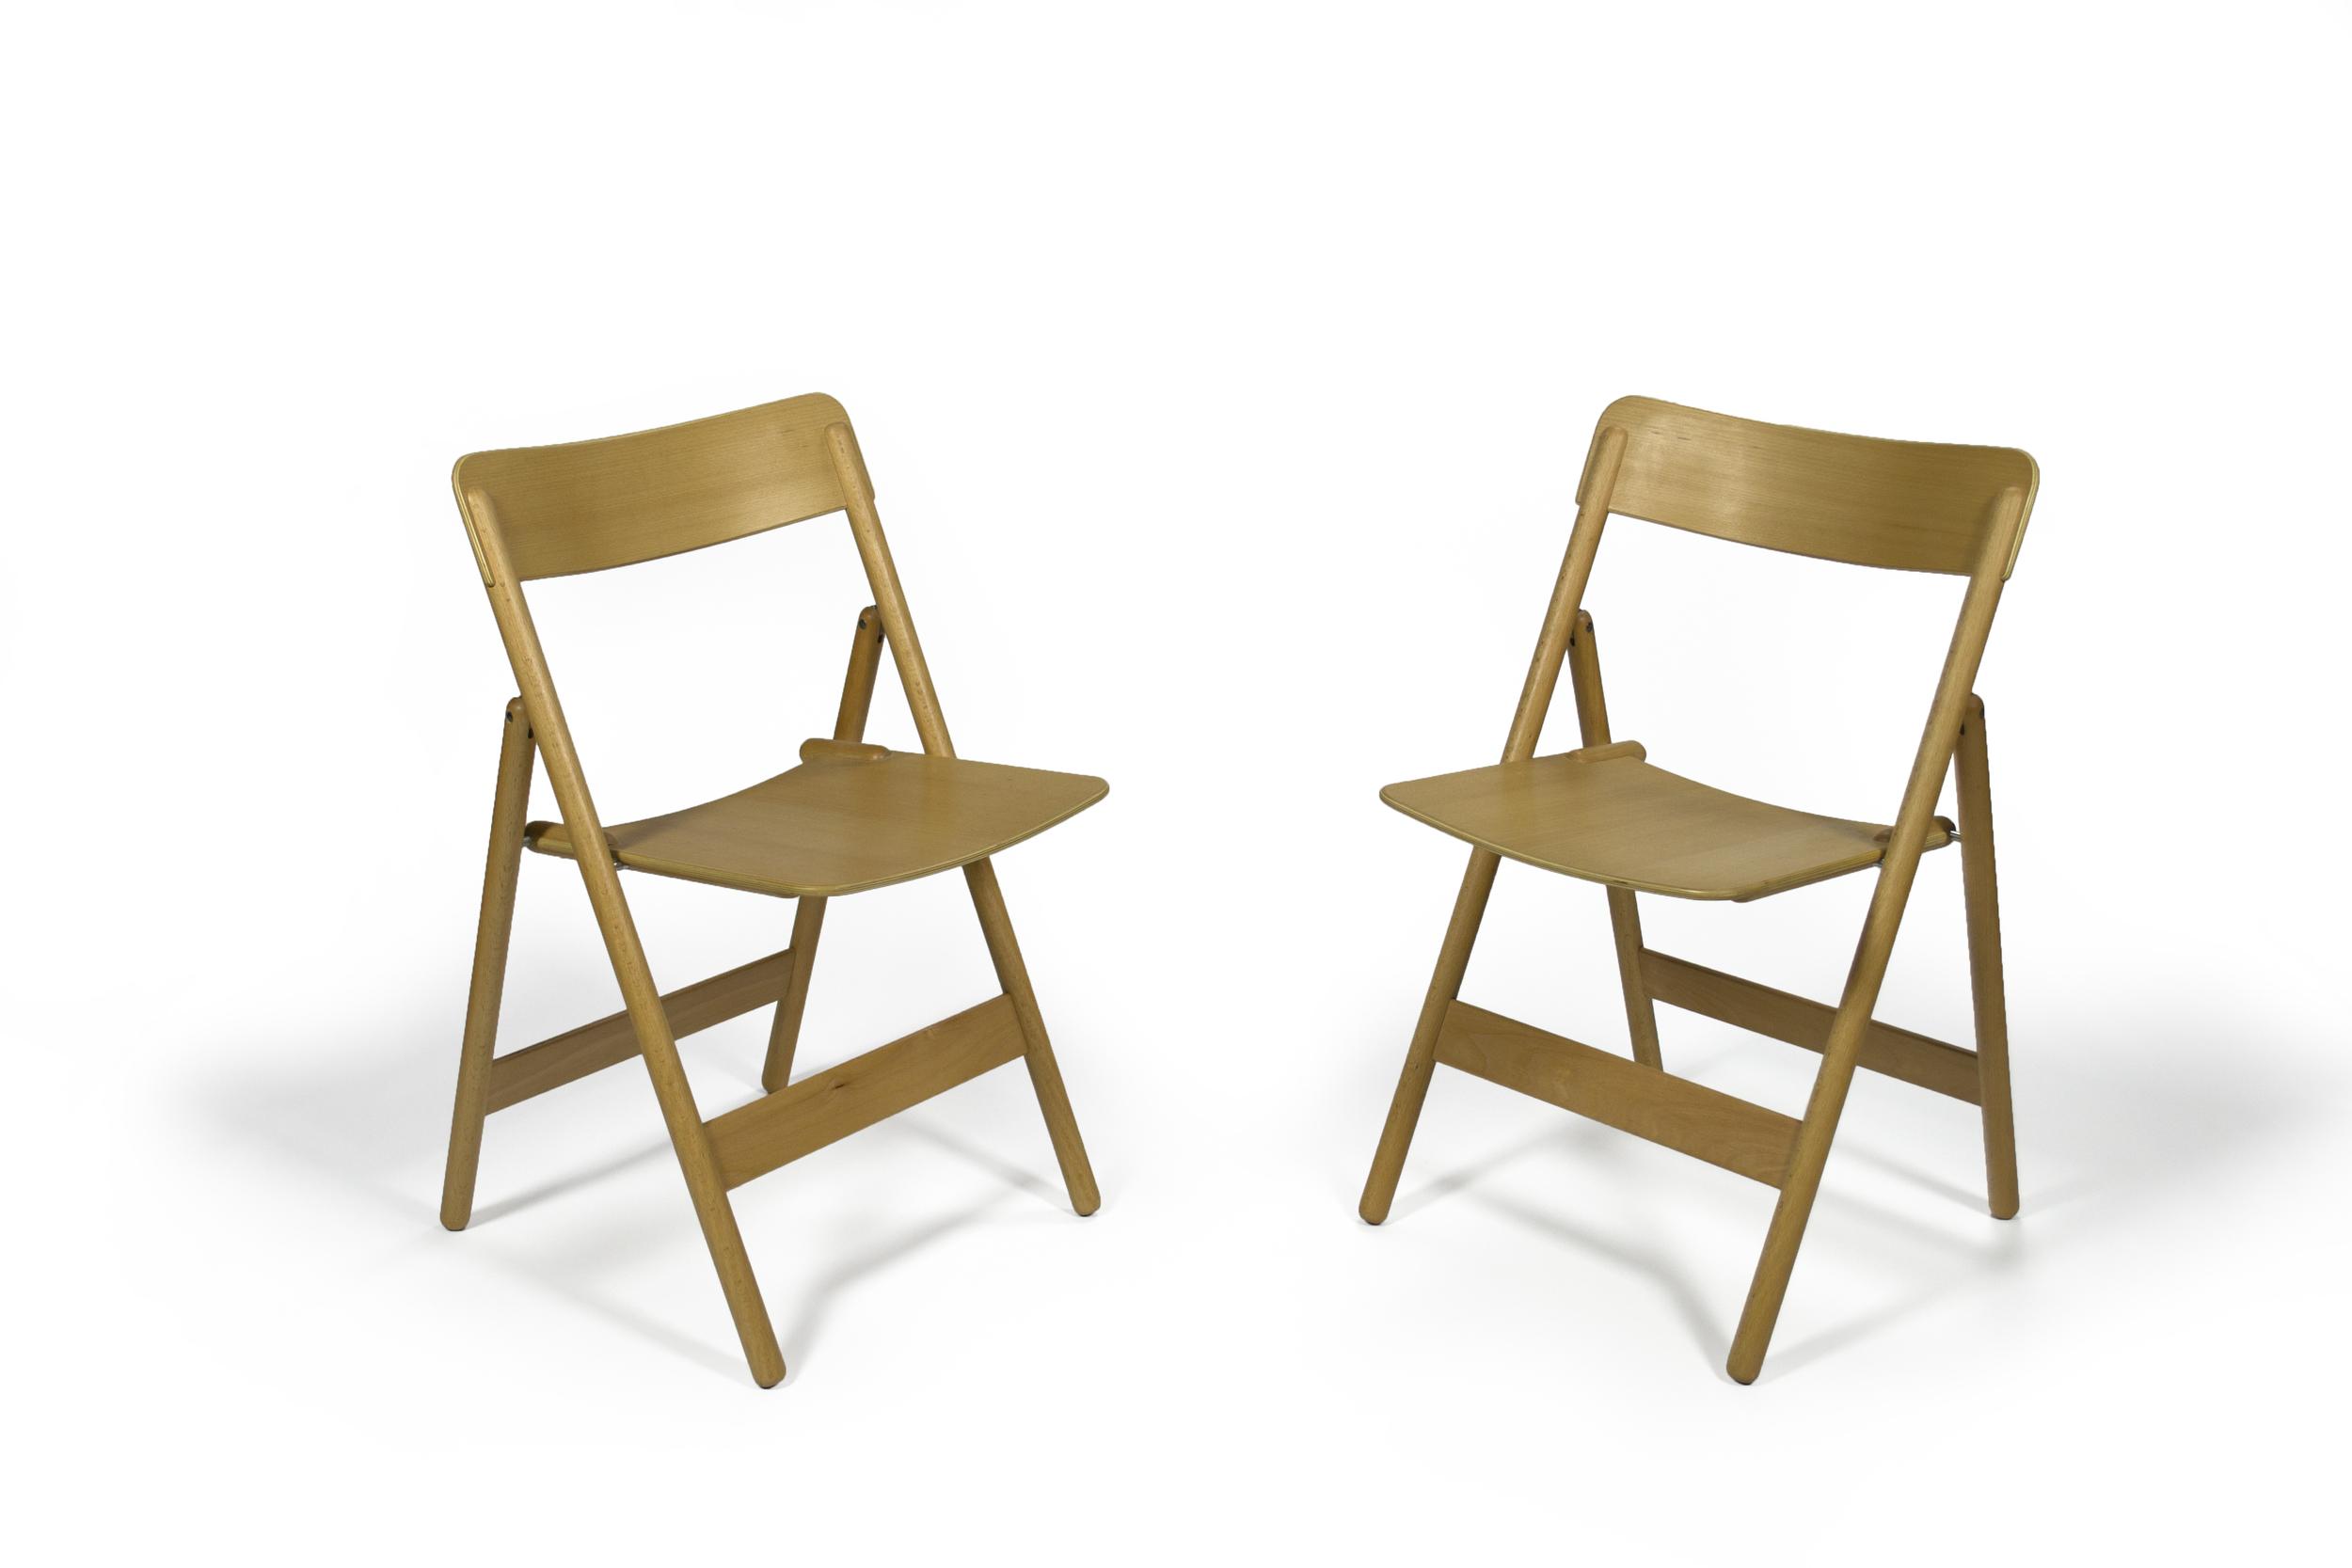 foldingchair_forword.jpg